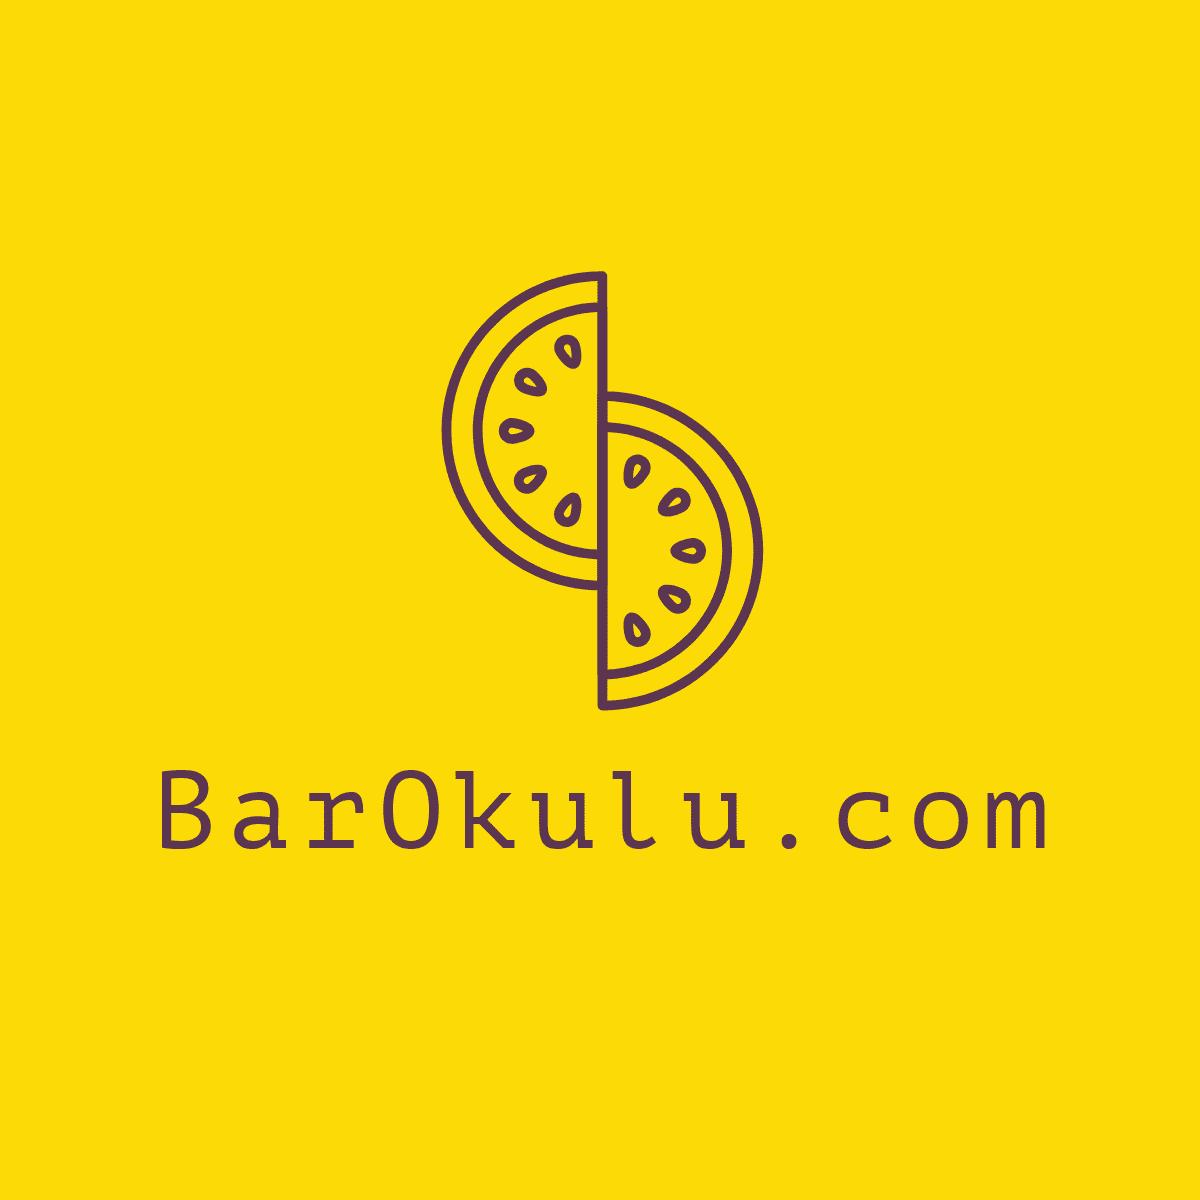 www.barokulu.com